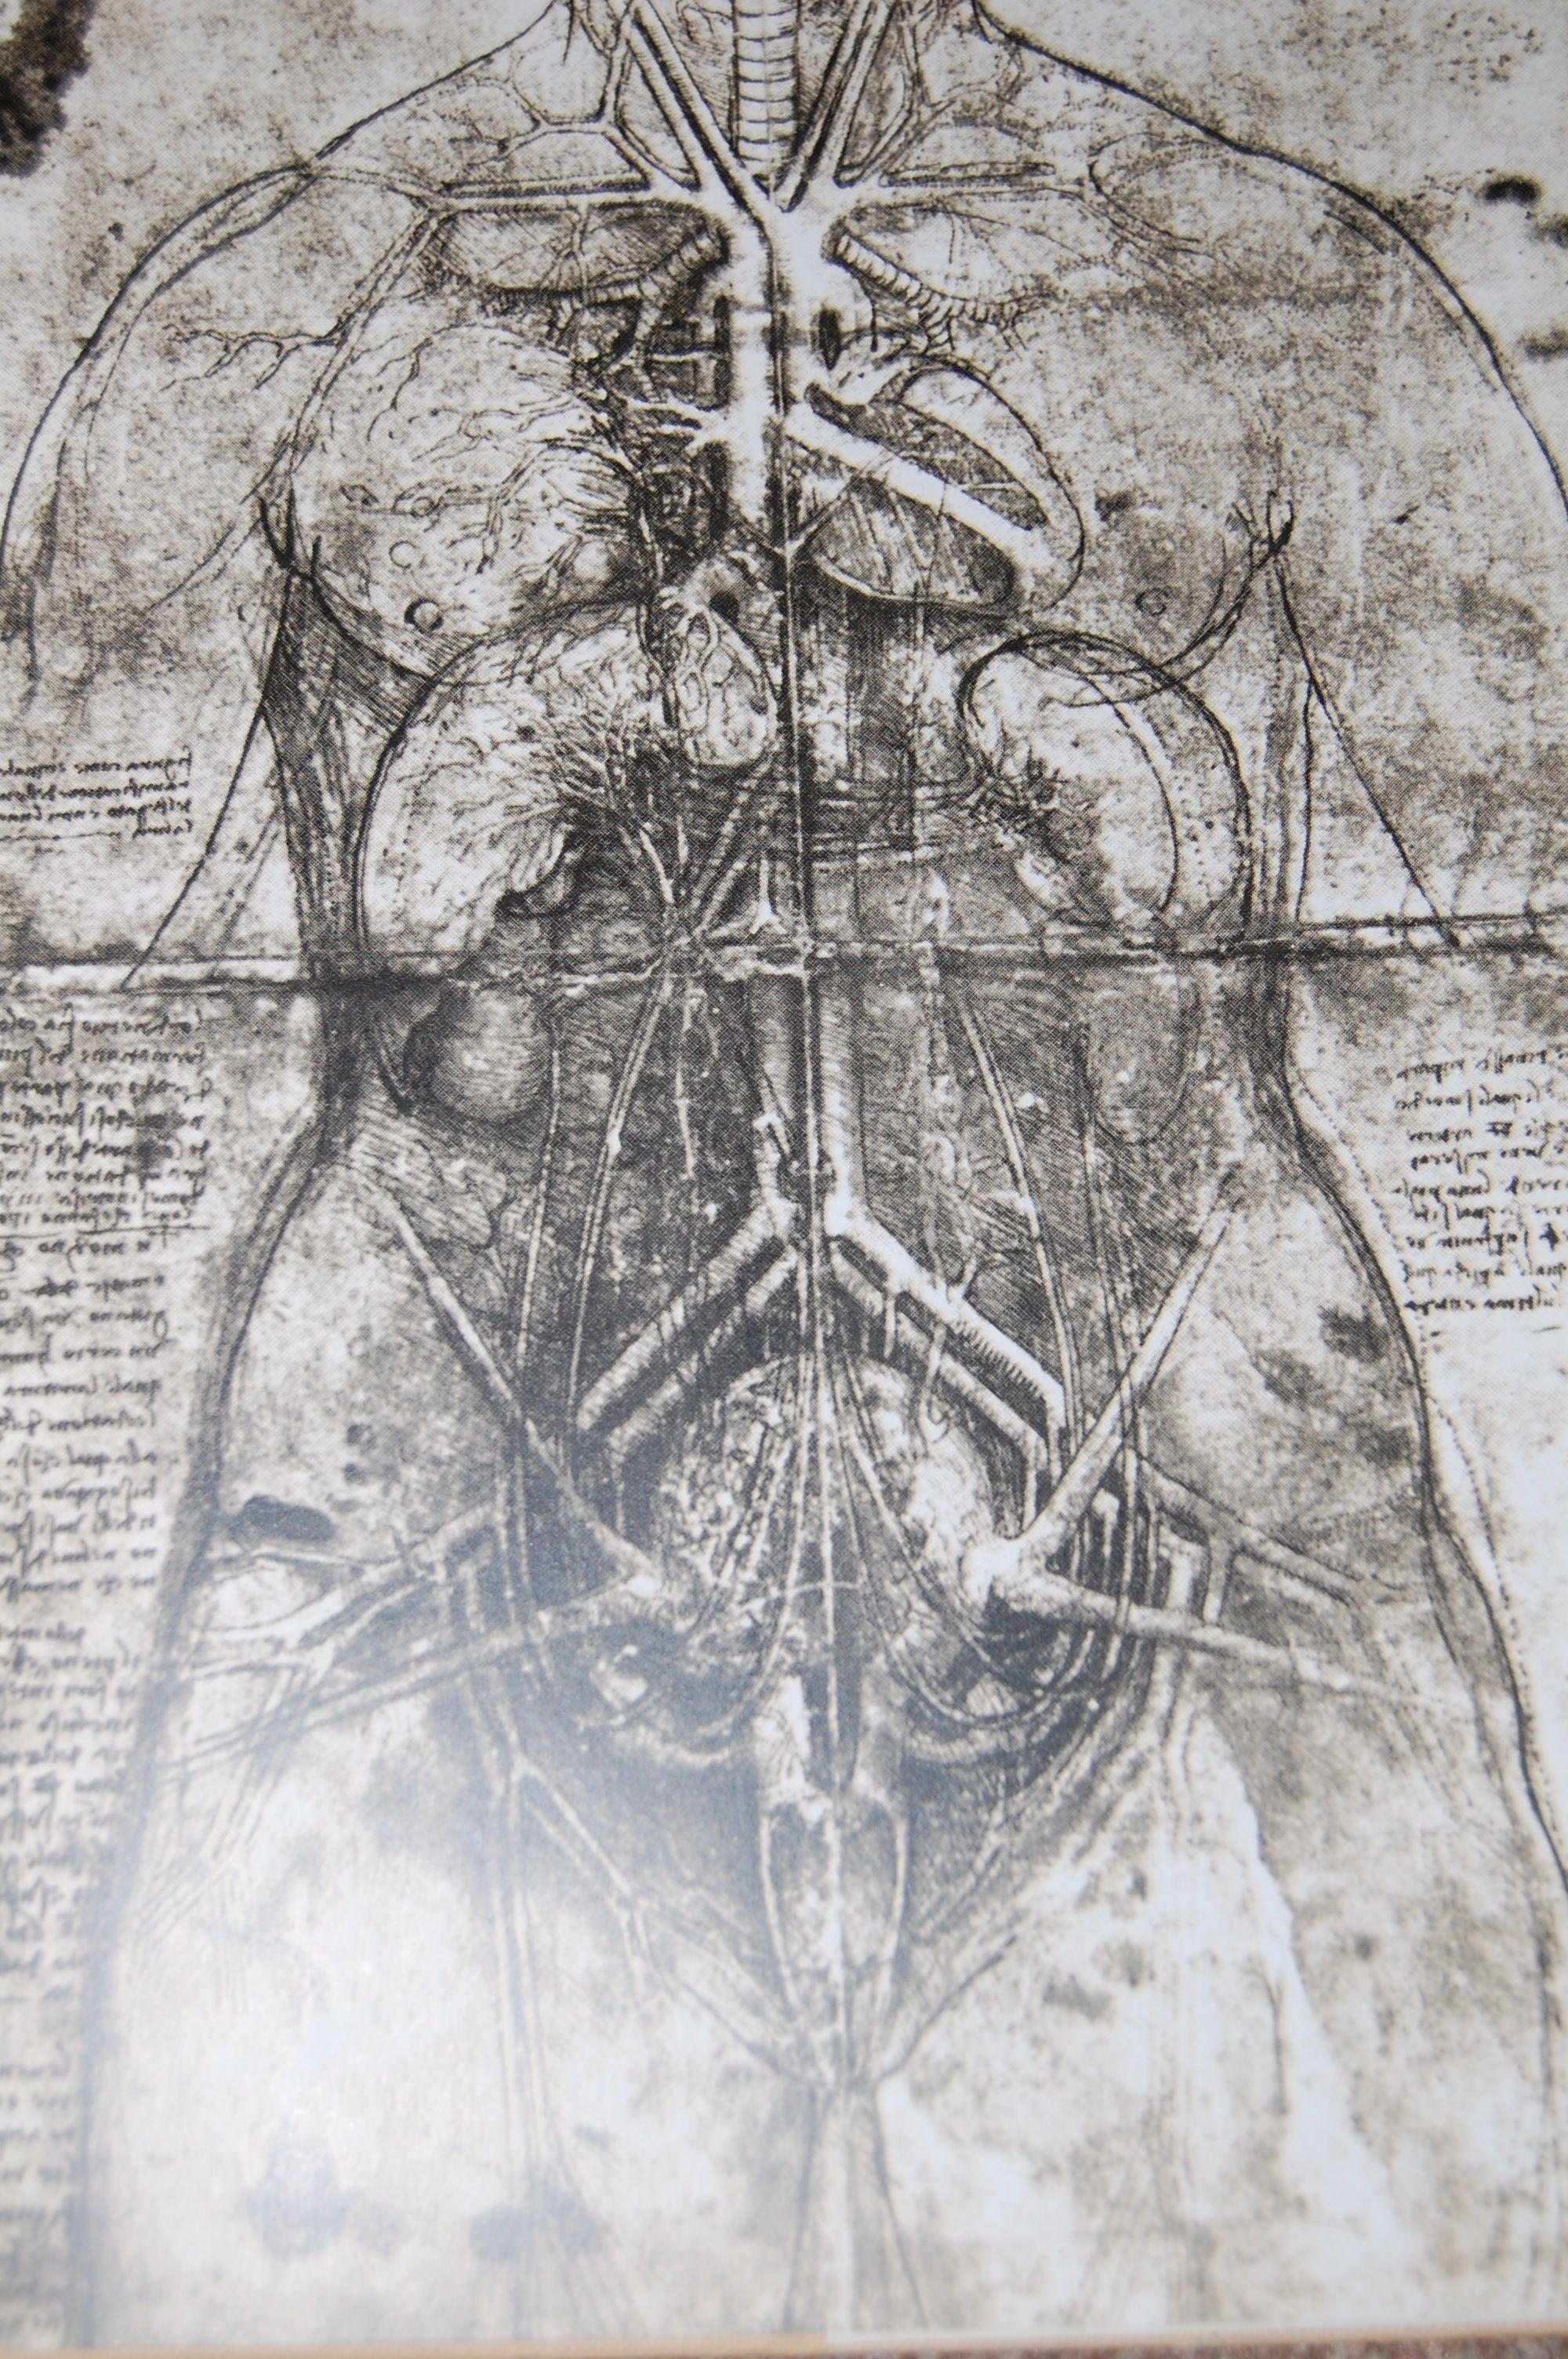 Leonardo Da Vinci: Anatomical drawings; appropriate visual language ...